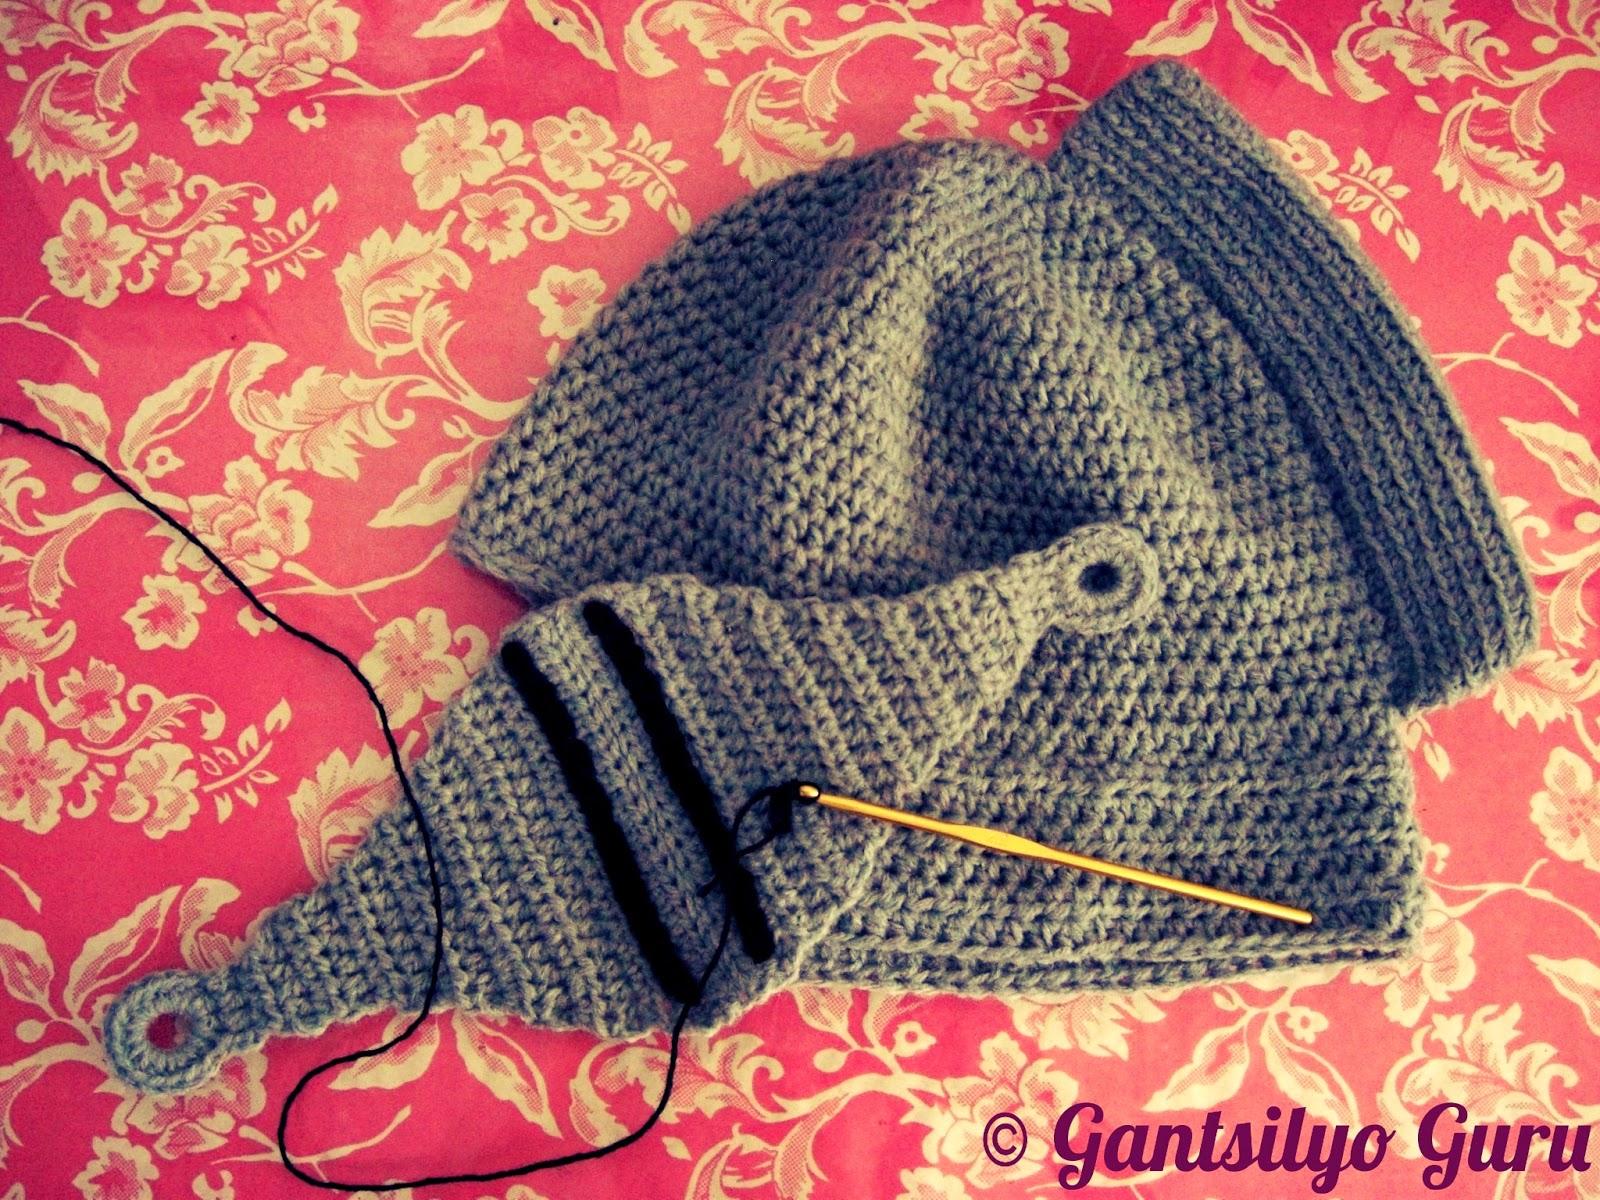 Gantsilyo Guru: Crocheted Knight Helmet